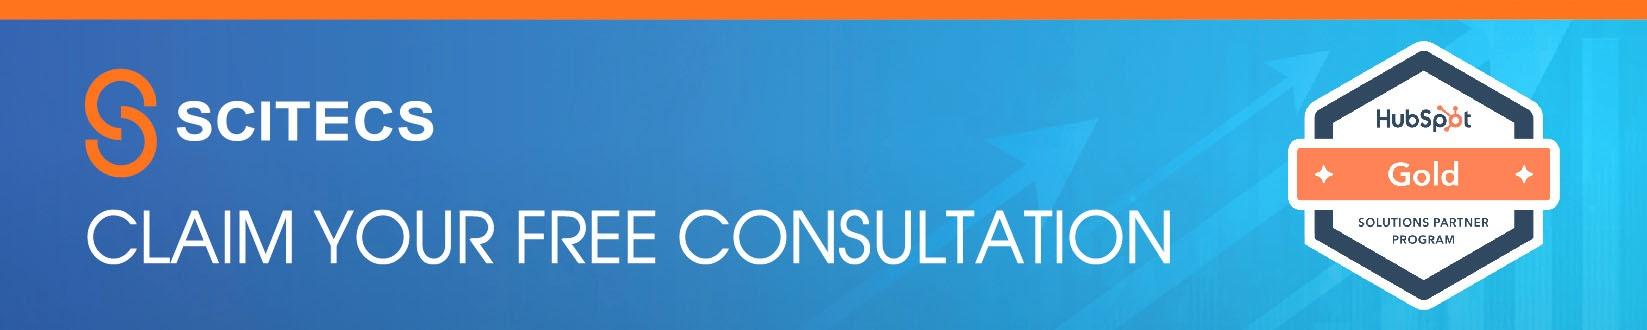 Claim your free consultation